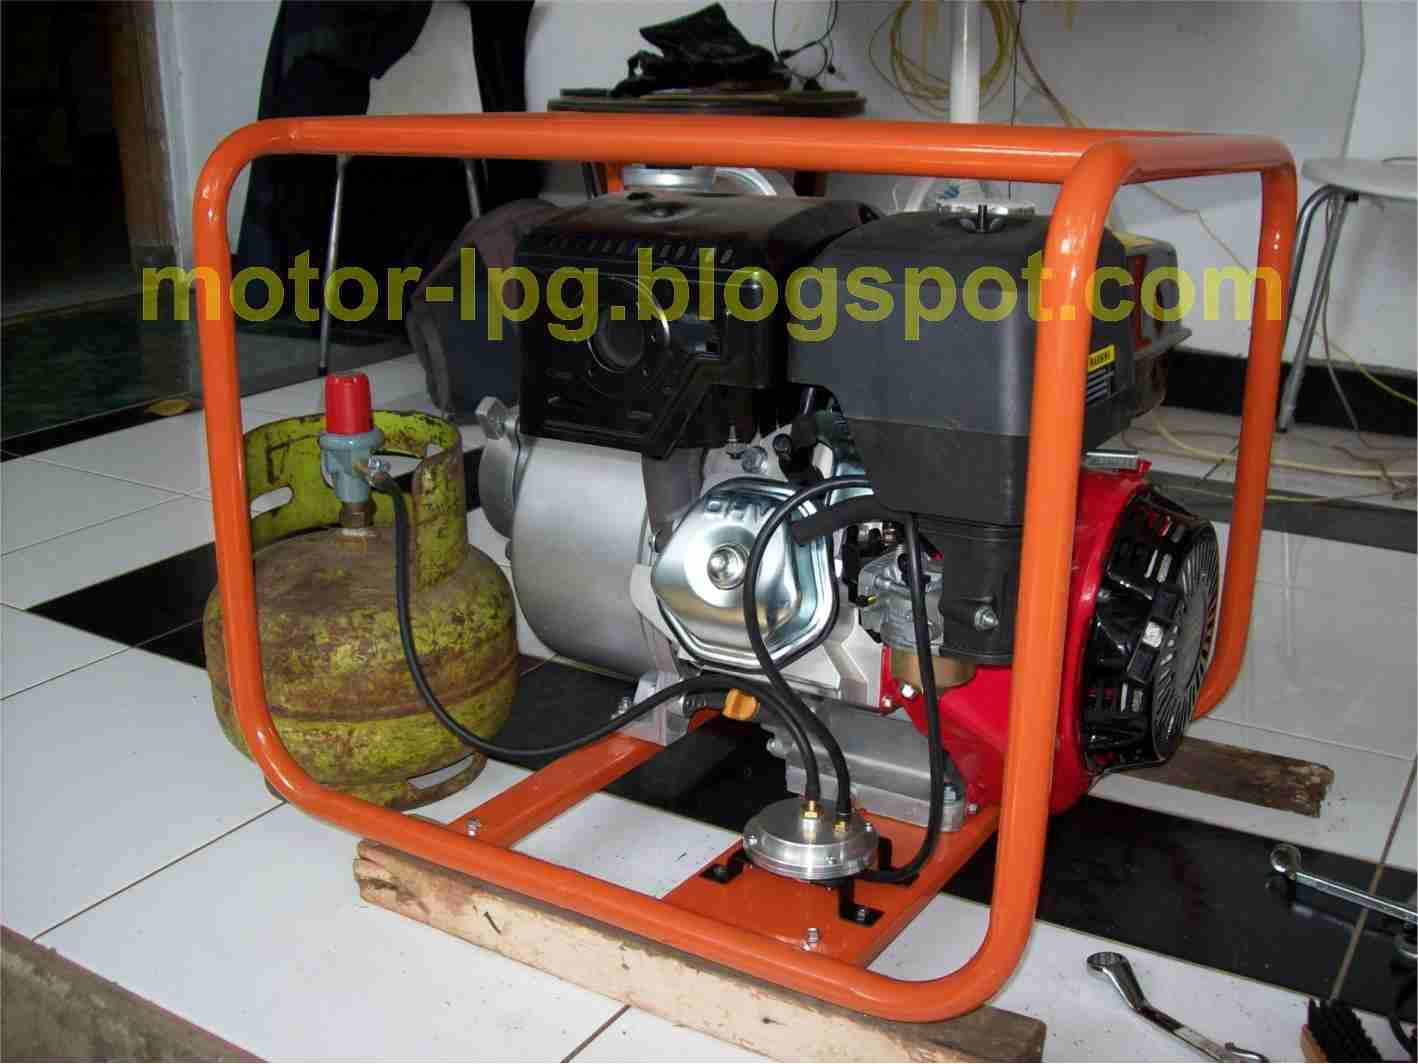 Konverter Kit LPG untuk Sepeda Motor: Membuat Konverter Kit LPG ...